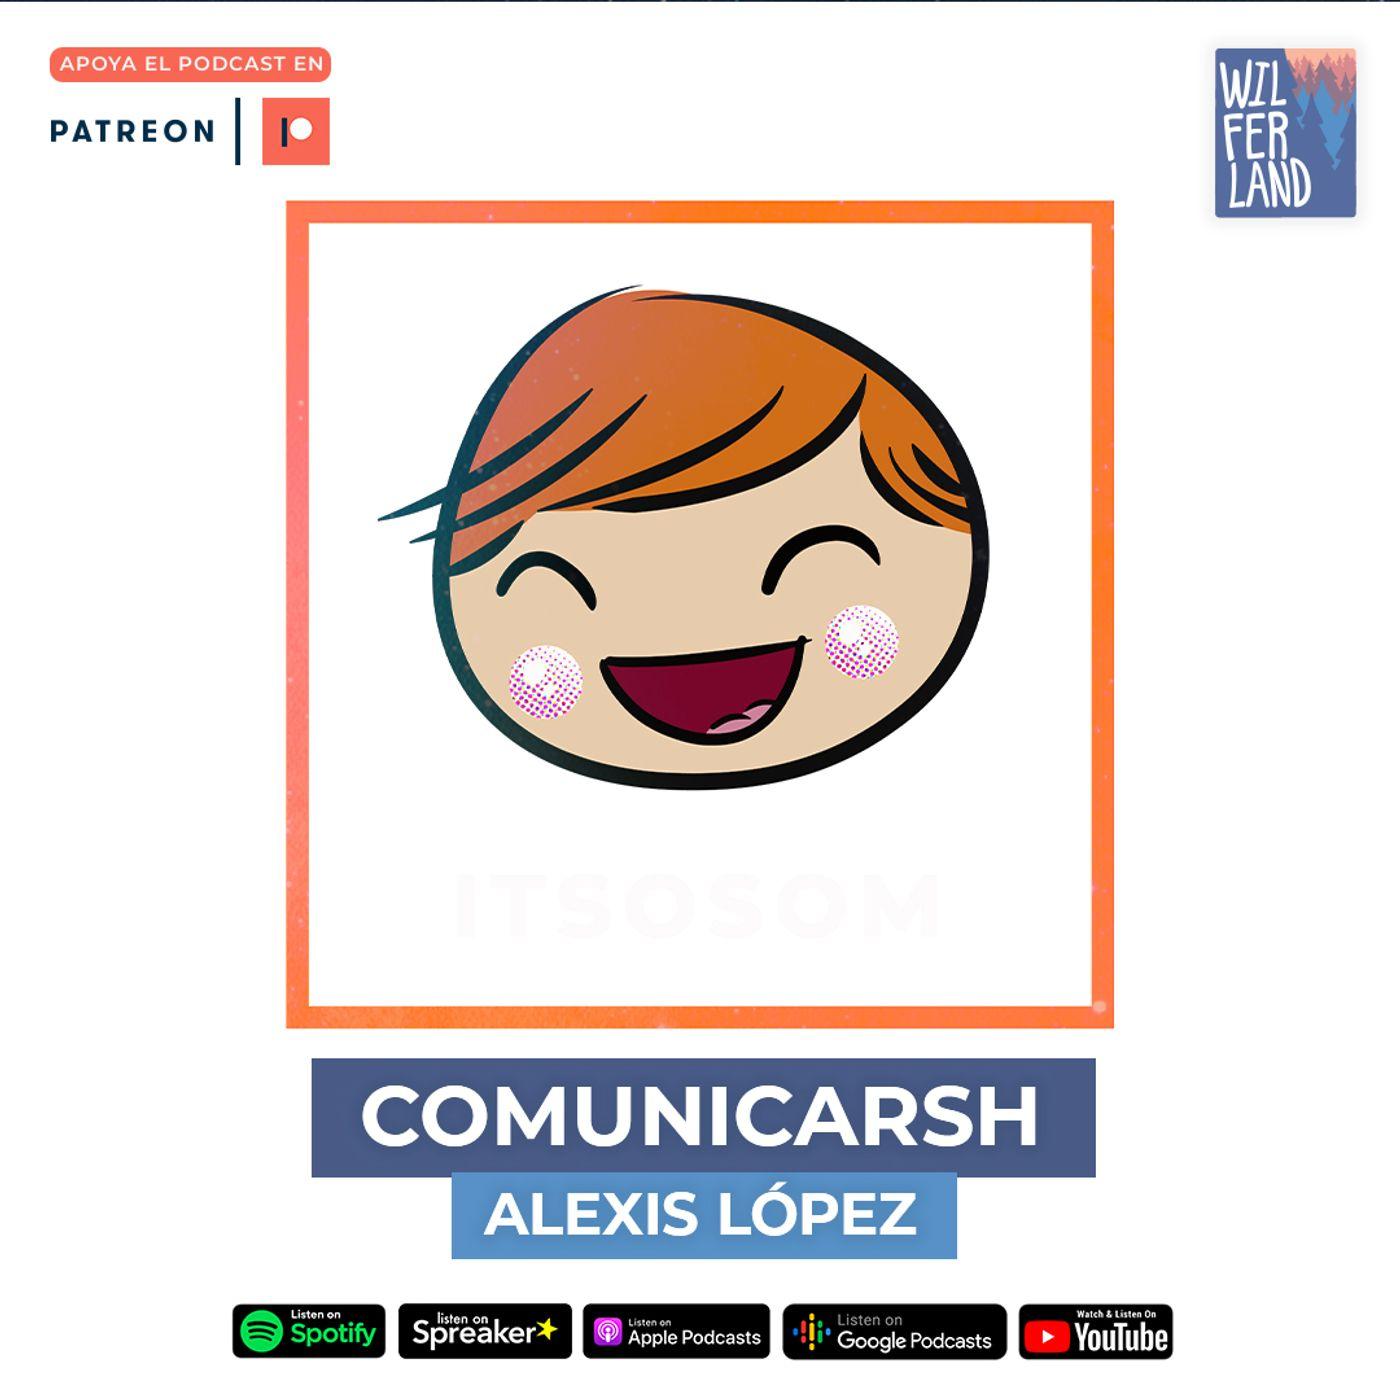 COMUNICARSH